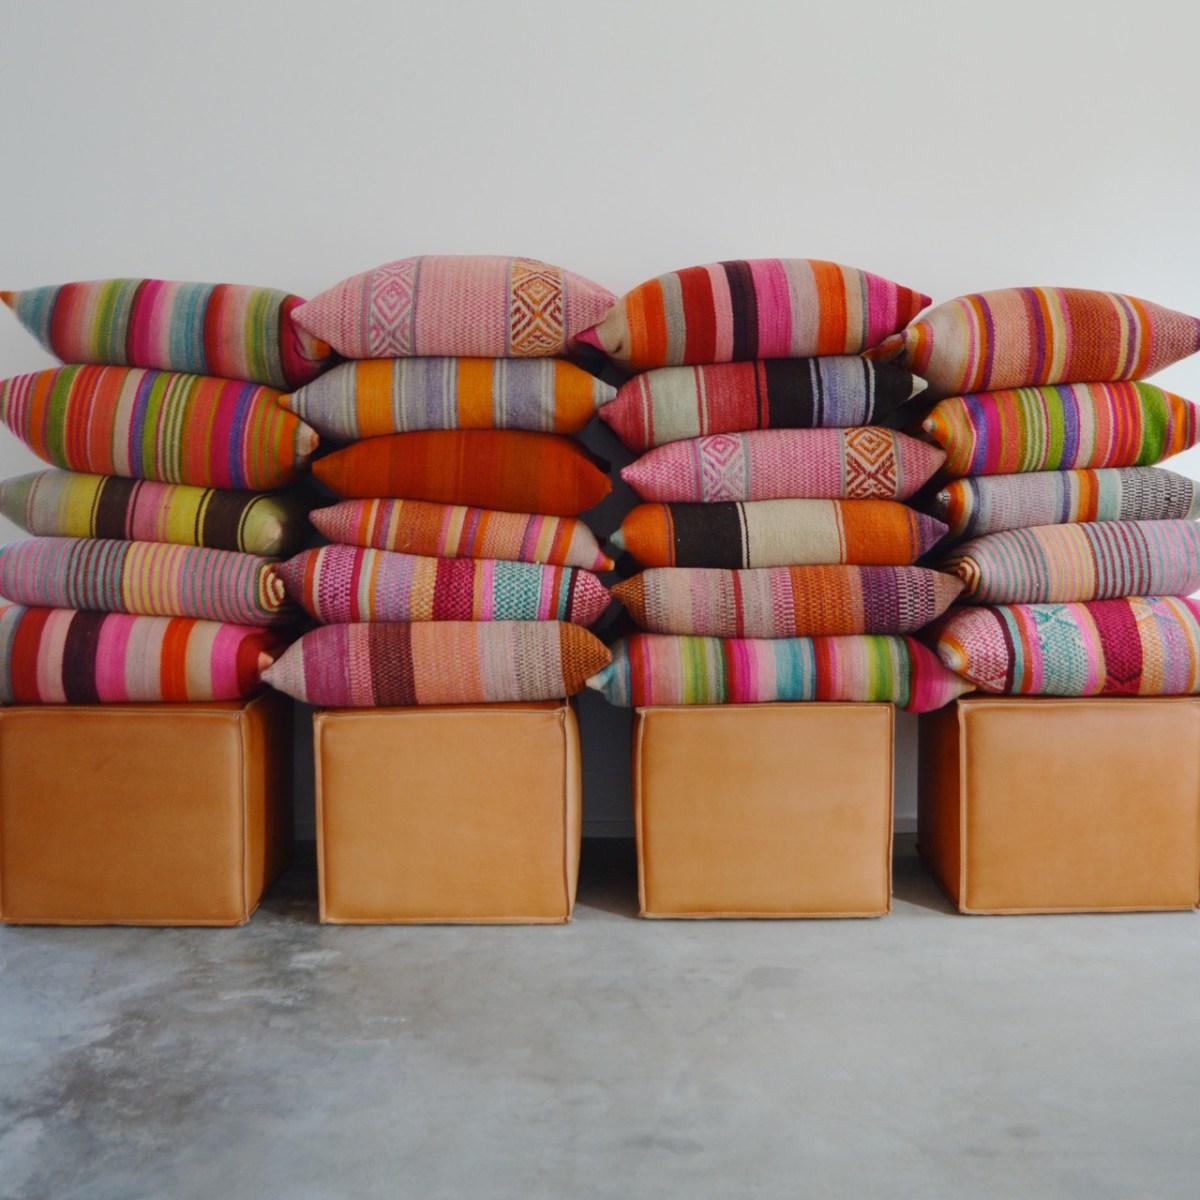 The Frazada & Peruvian Woven Goods